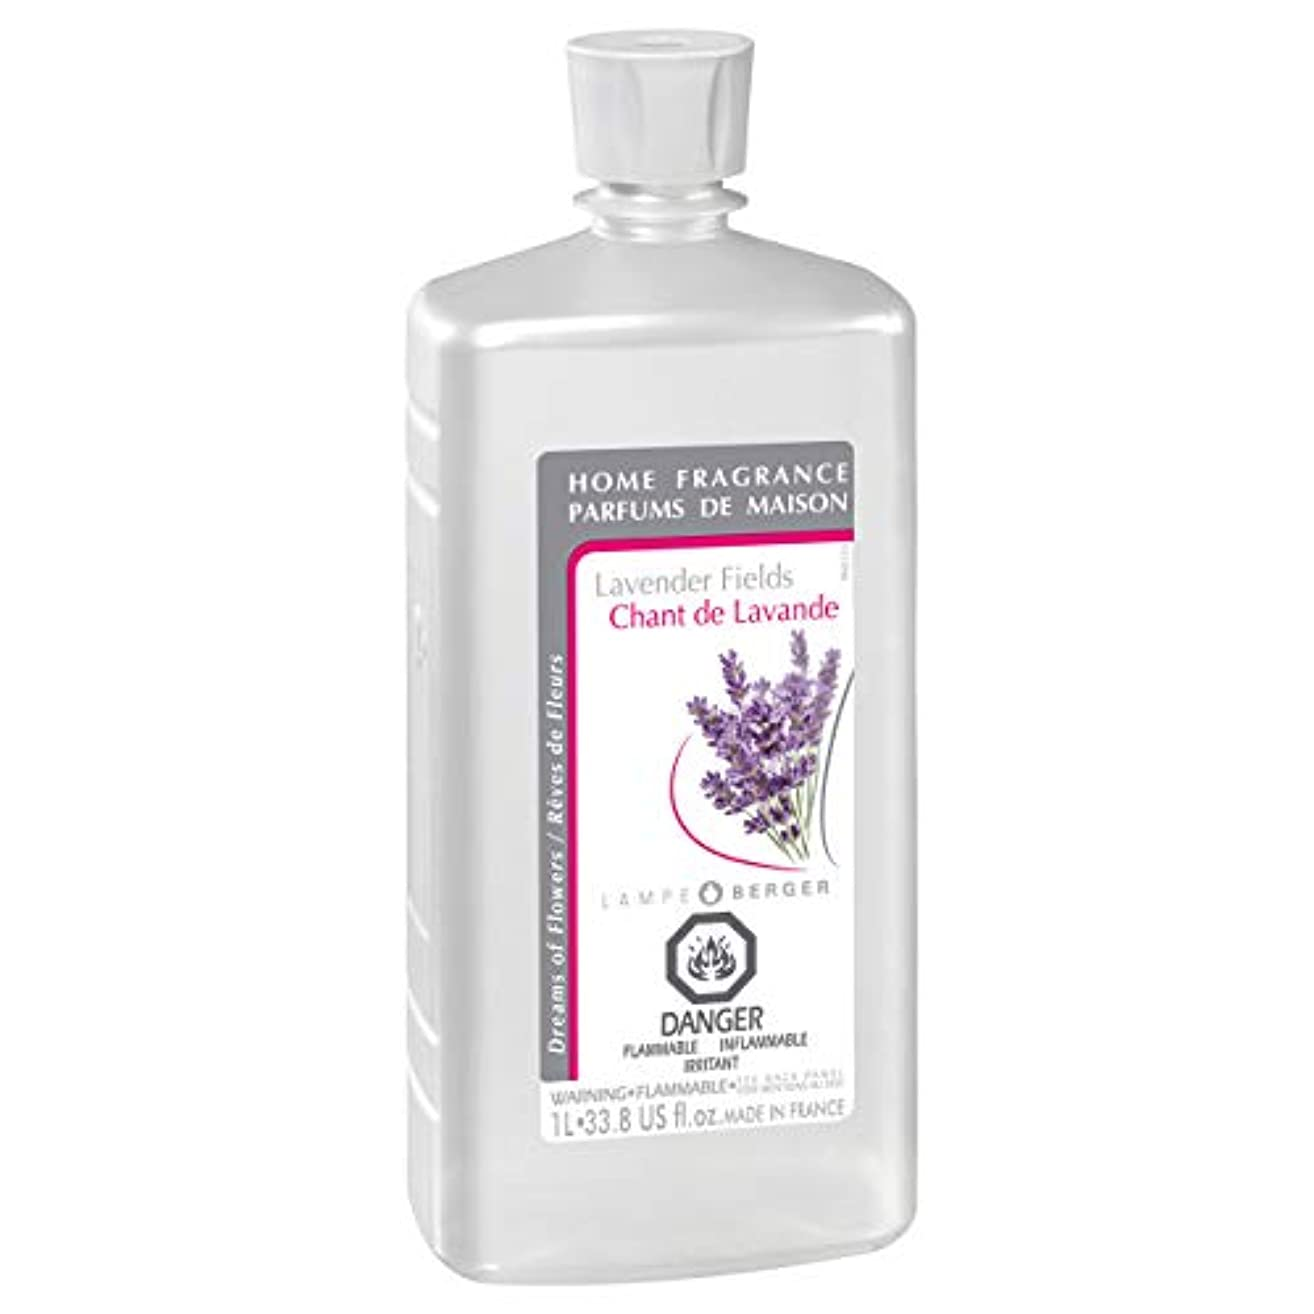 Lampe Berger Fragrance, 33.8 Fluid Ounce, Lavender Fields by Lampe Berger